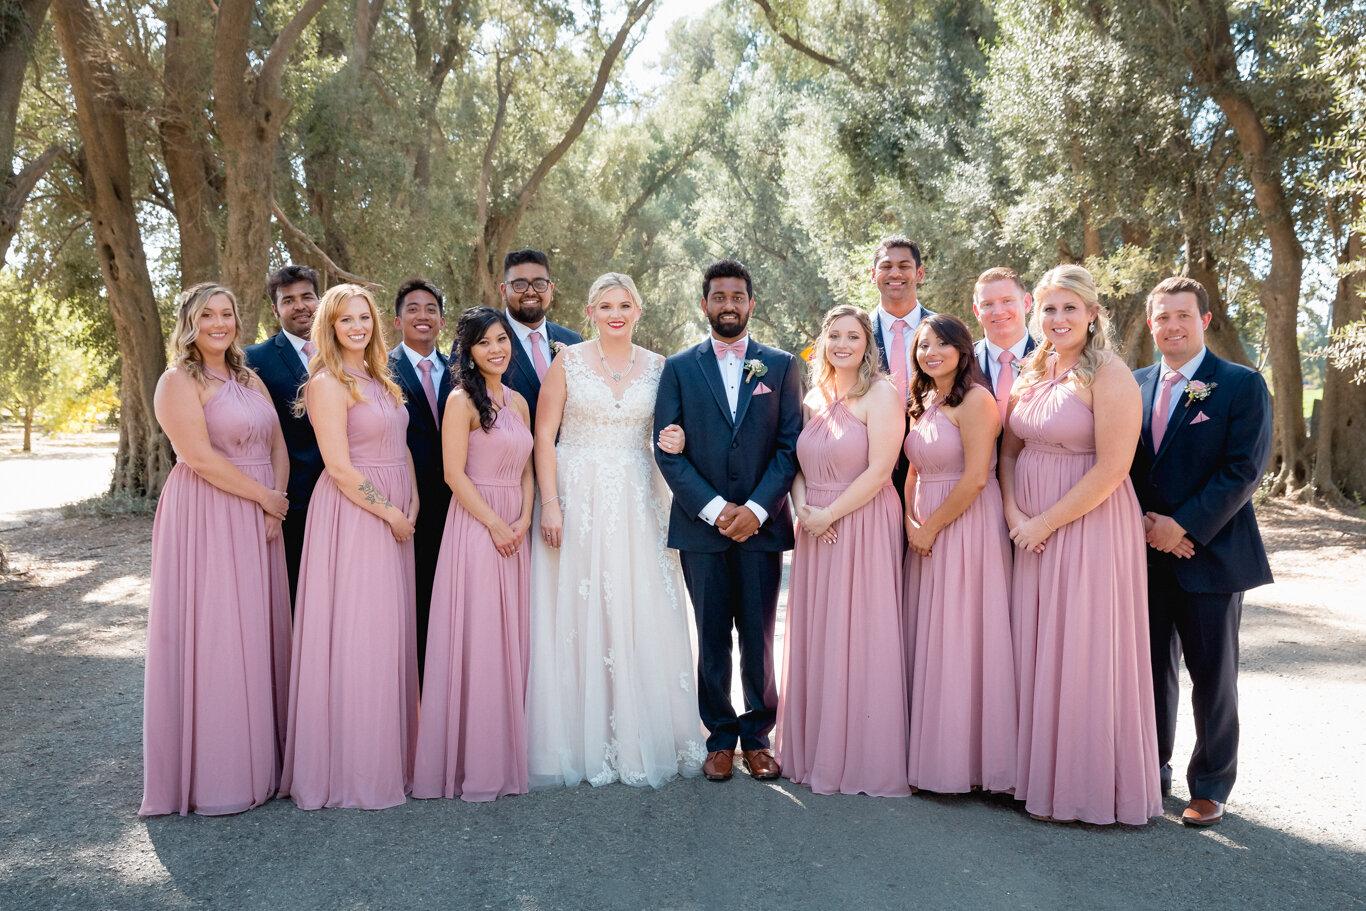 2019.08.24_Emily-Ashir-Wedding-at-the-Maples-5438.jpg